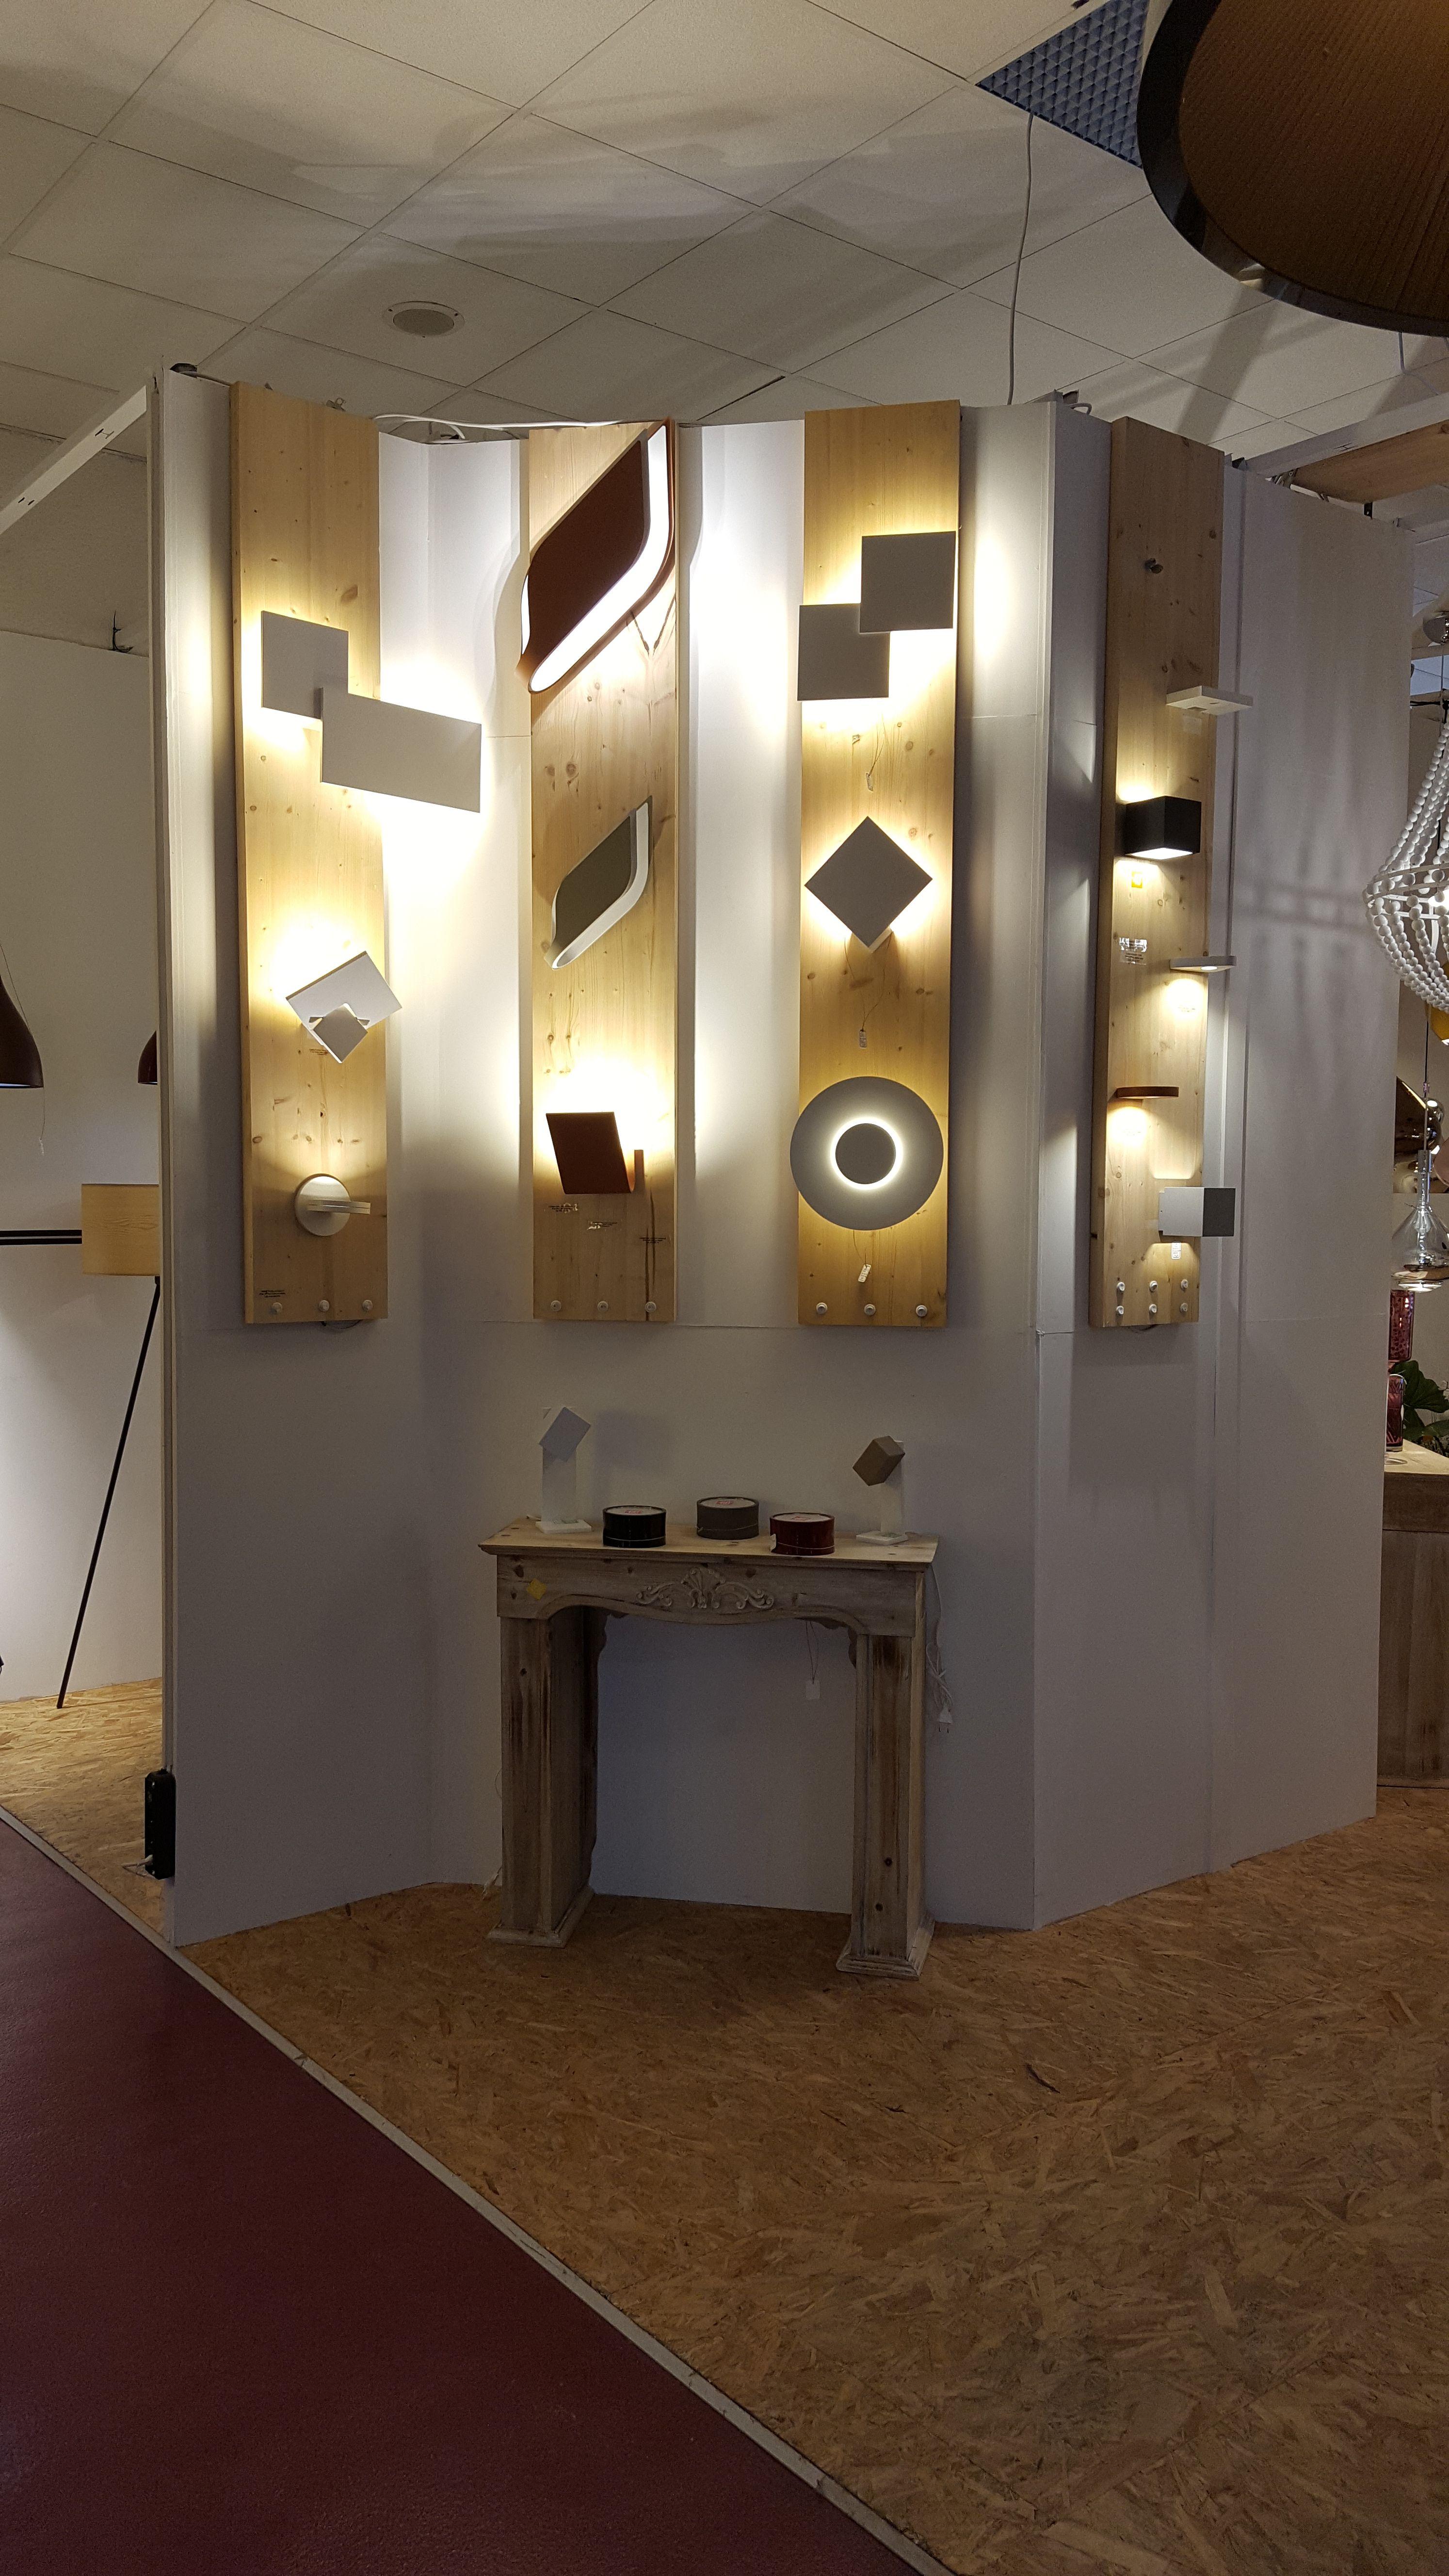 Eclairage Cuisine Led Plafond luminaire, lampadaire, luminaire design, design, plafonnier